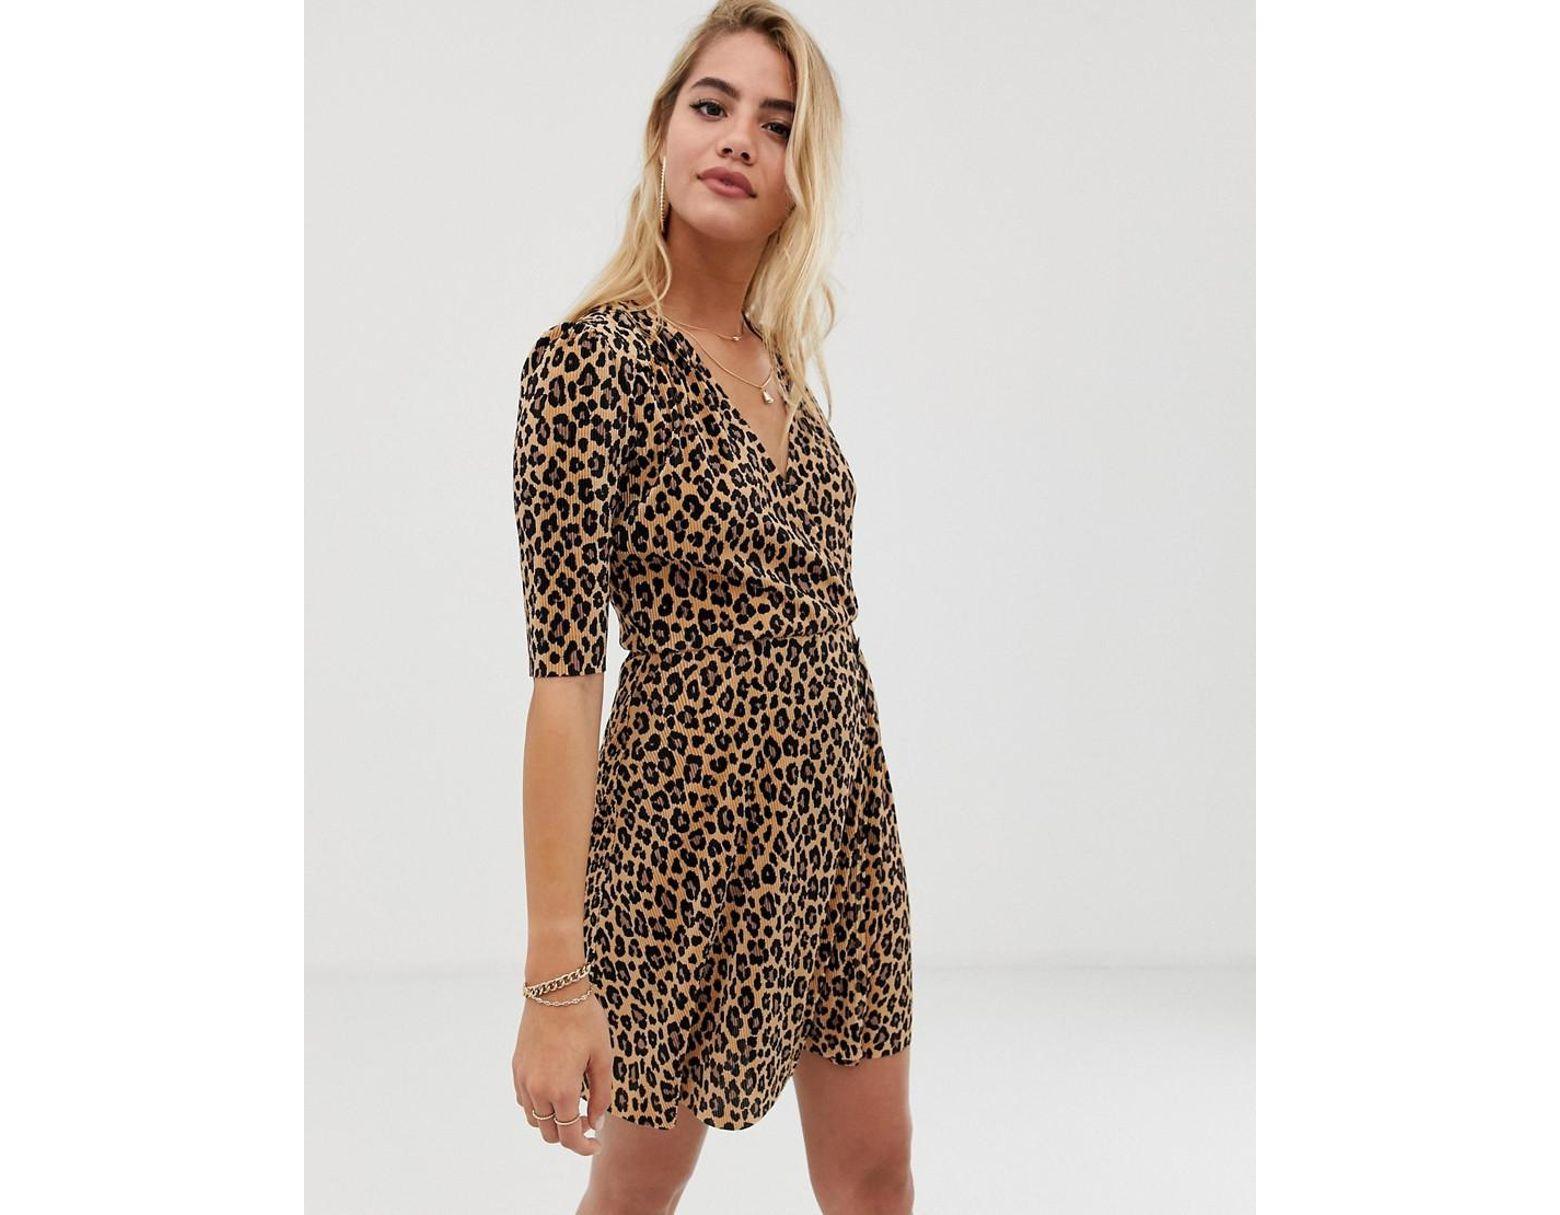 f3ba33a7fe92 ASOS Asos Design Petite Leopard Print Plisse Mini Dress With Button Detail  in Brown - Lyst